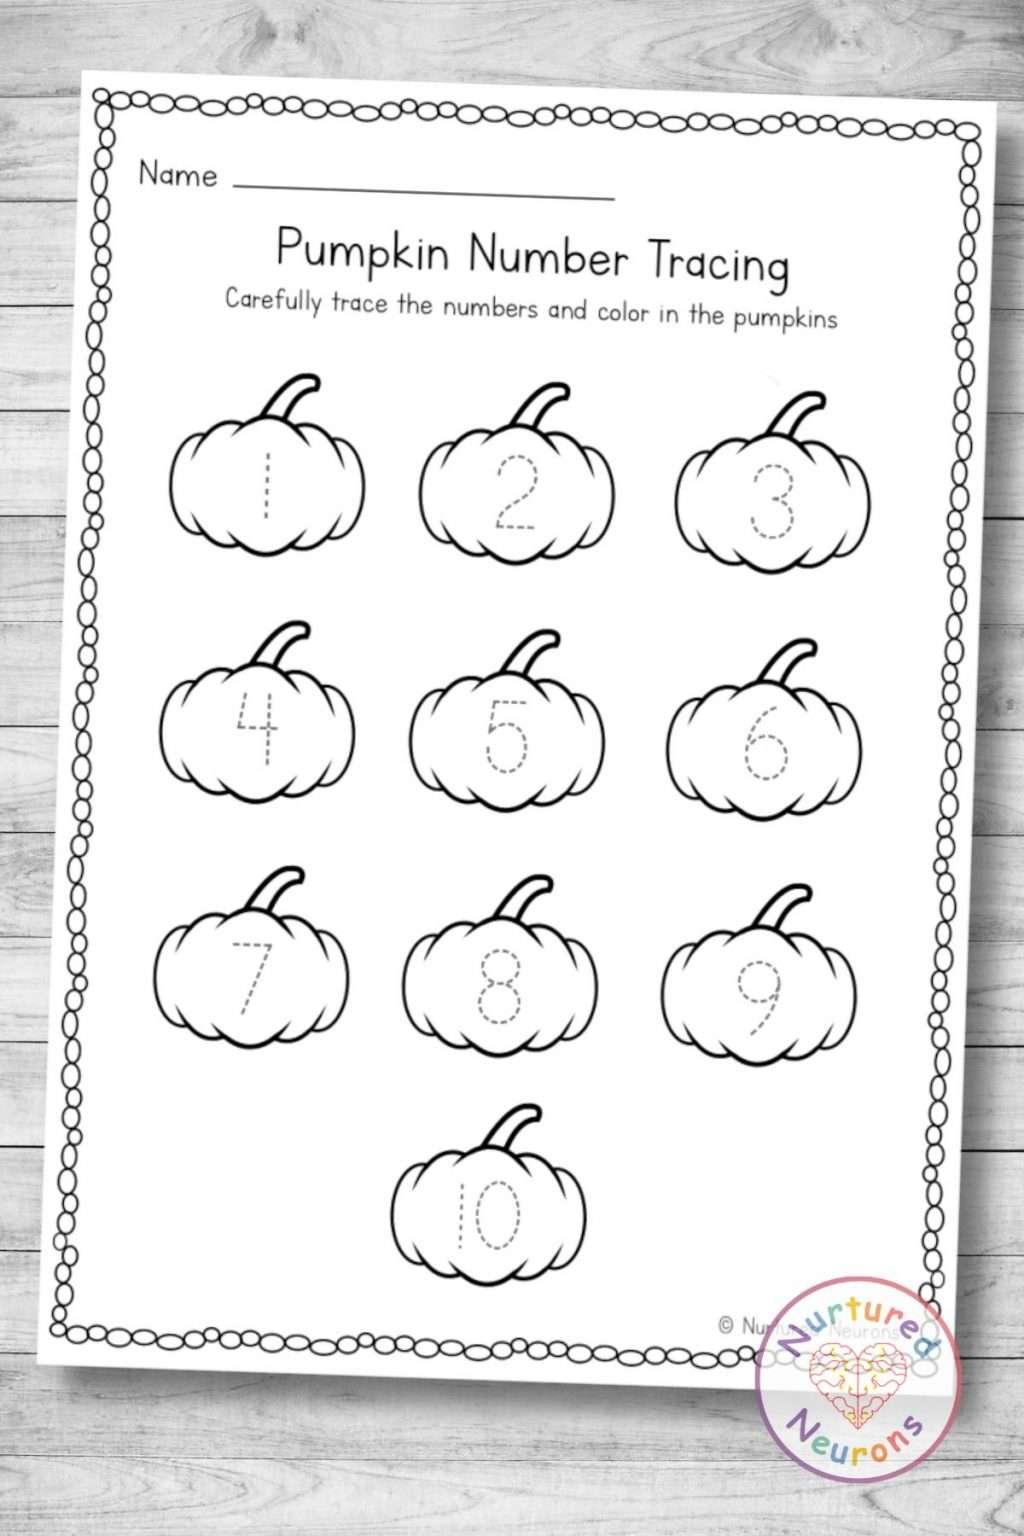 Printable pumpkin number tracing worksheet (kindergarten and preschool math download pdf)